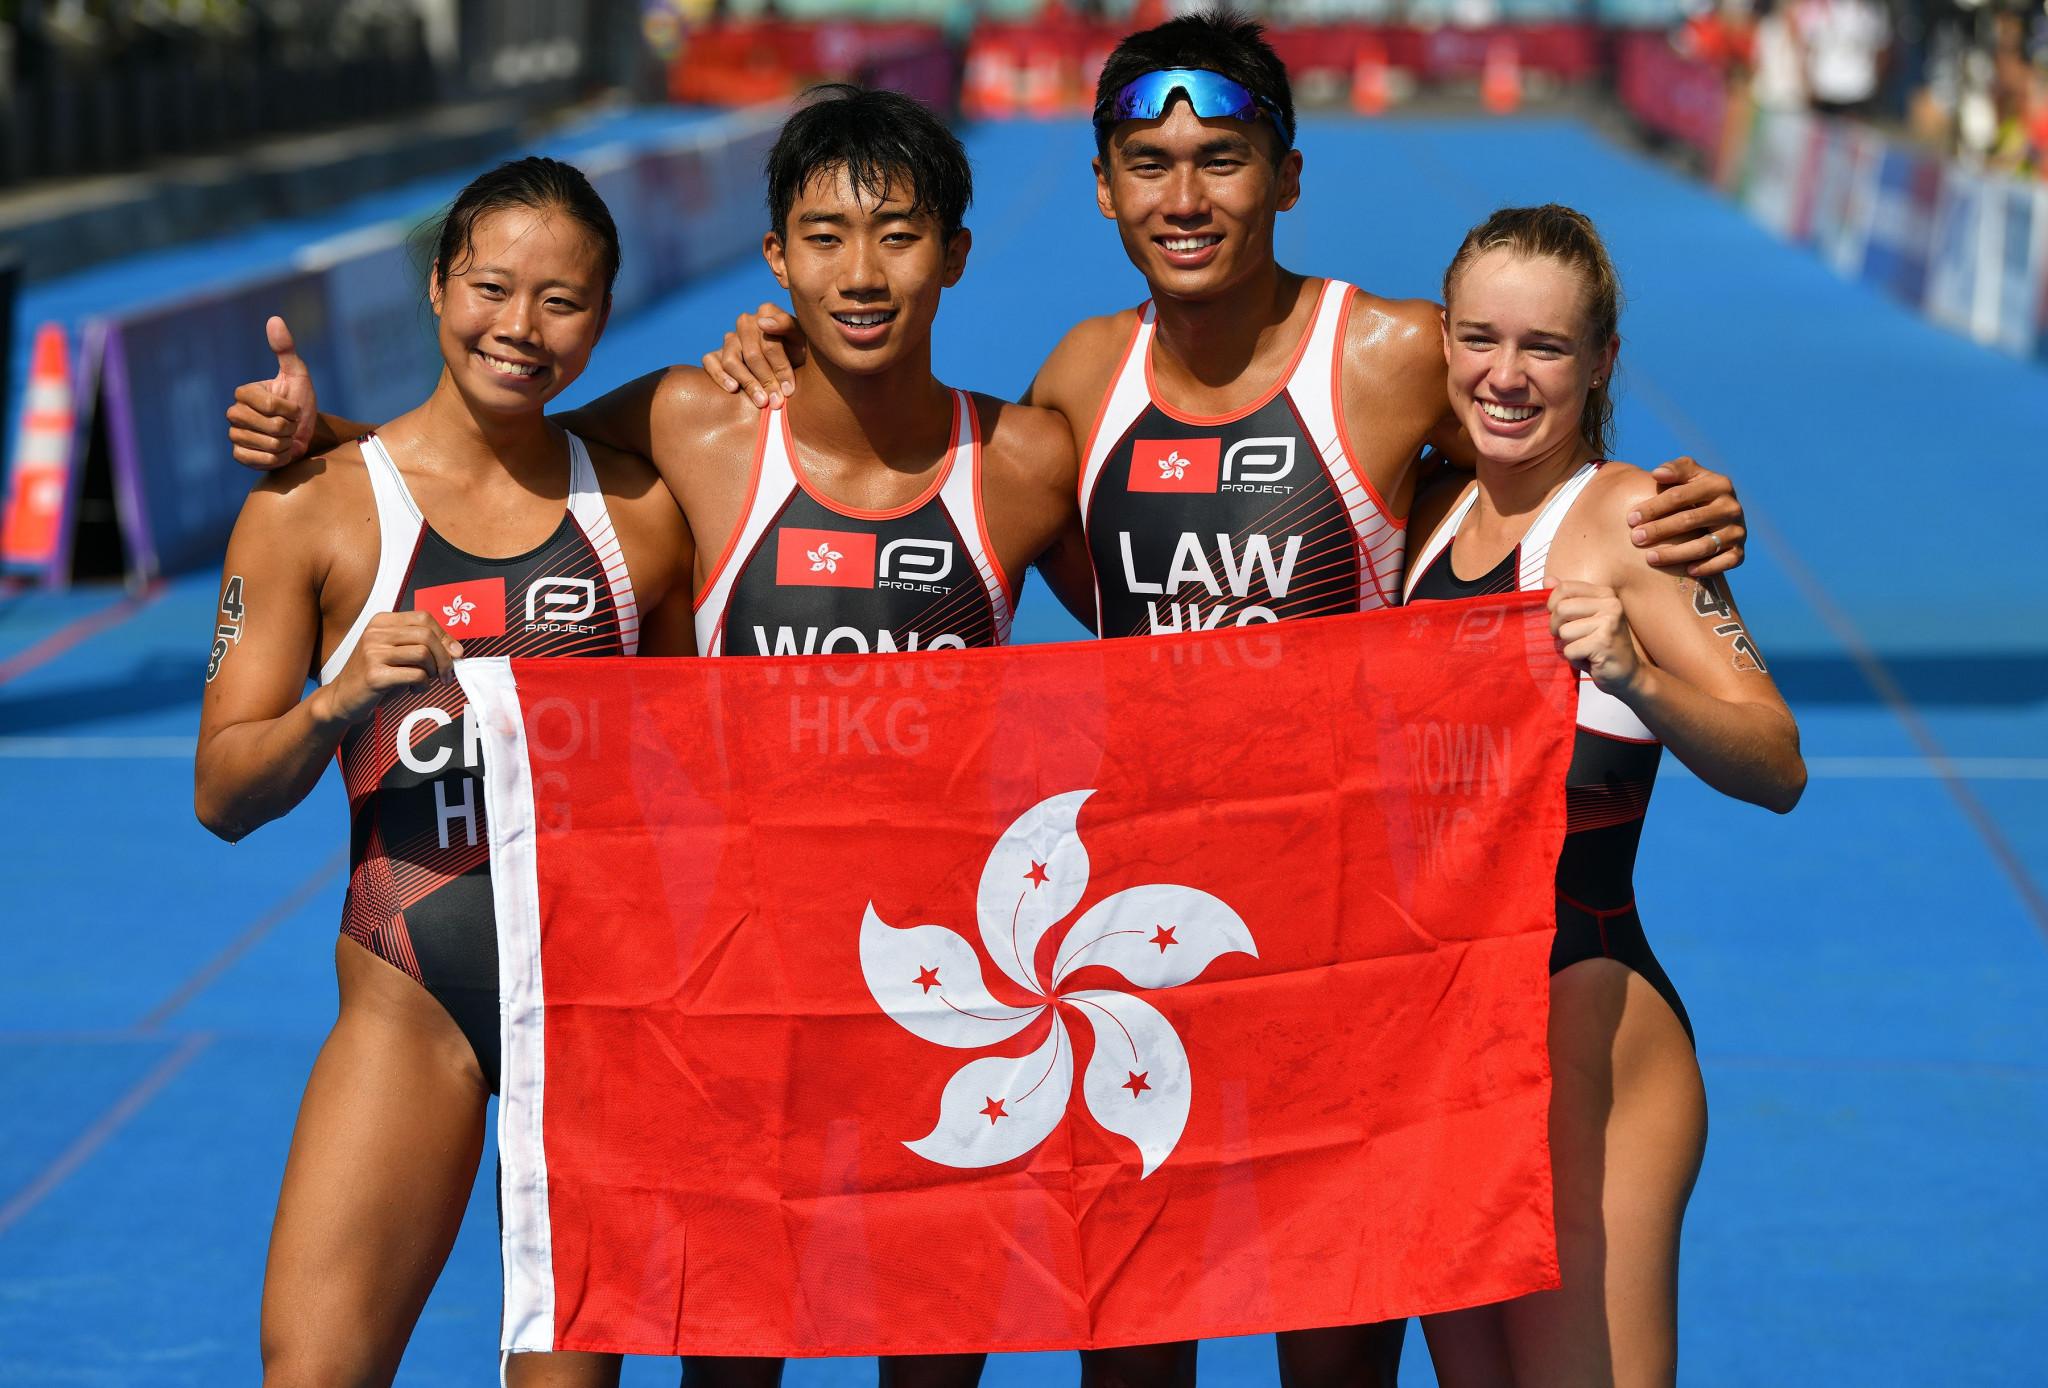 Hong Kong triathlon coaches depart amid report of lockdown breaches